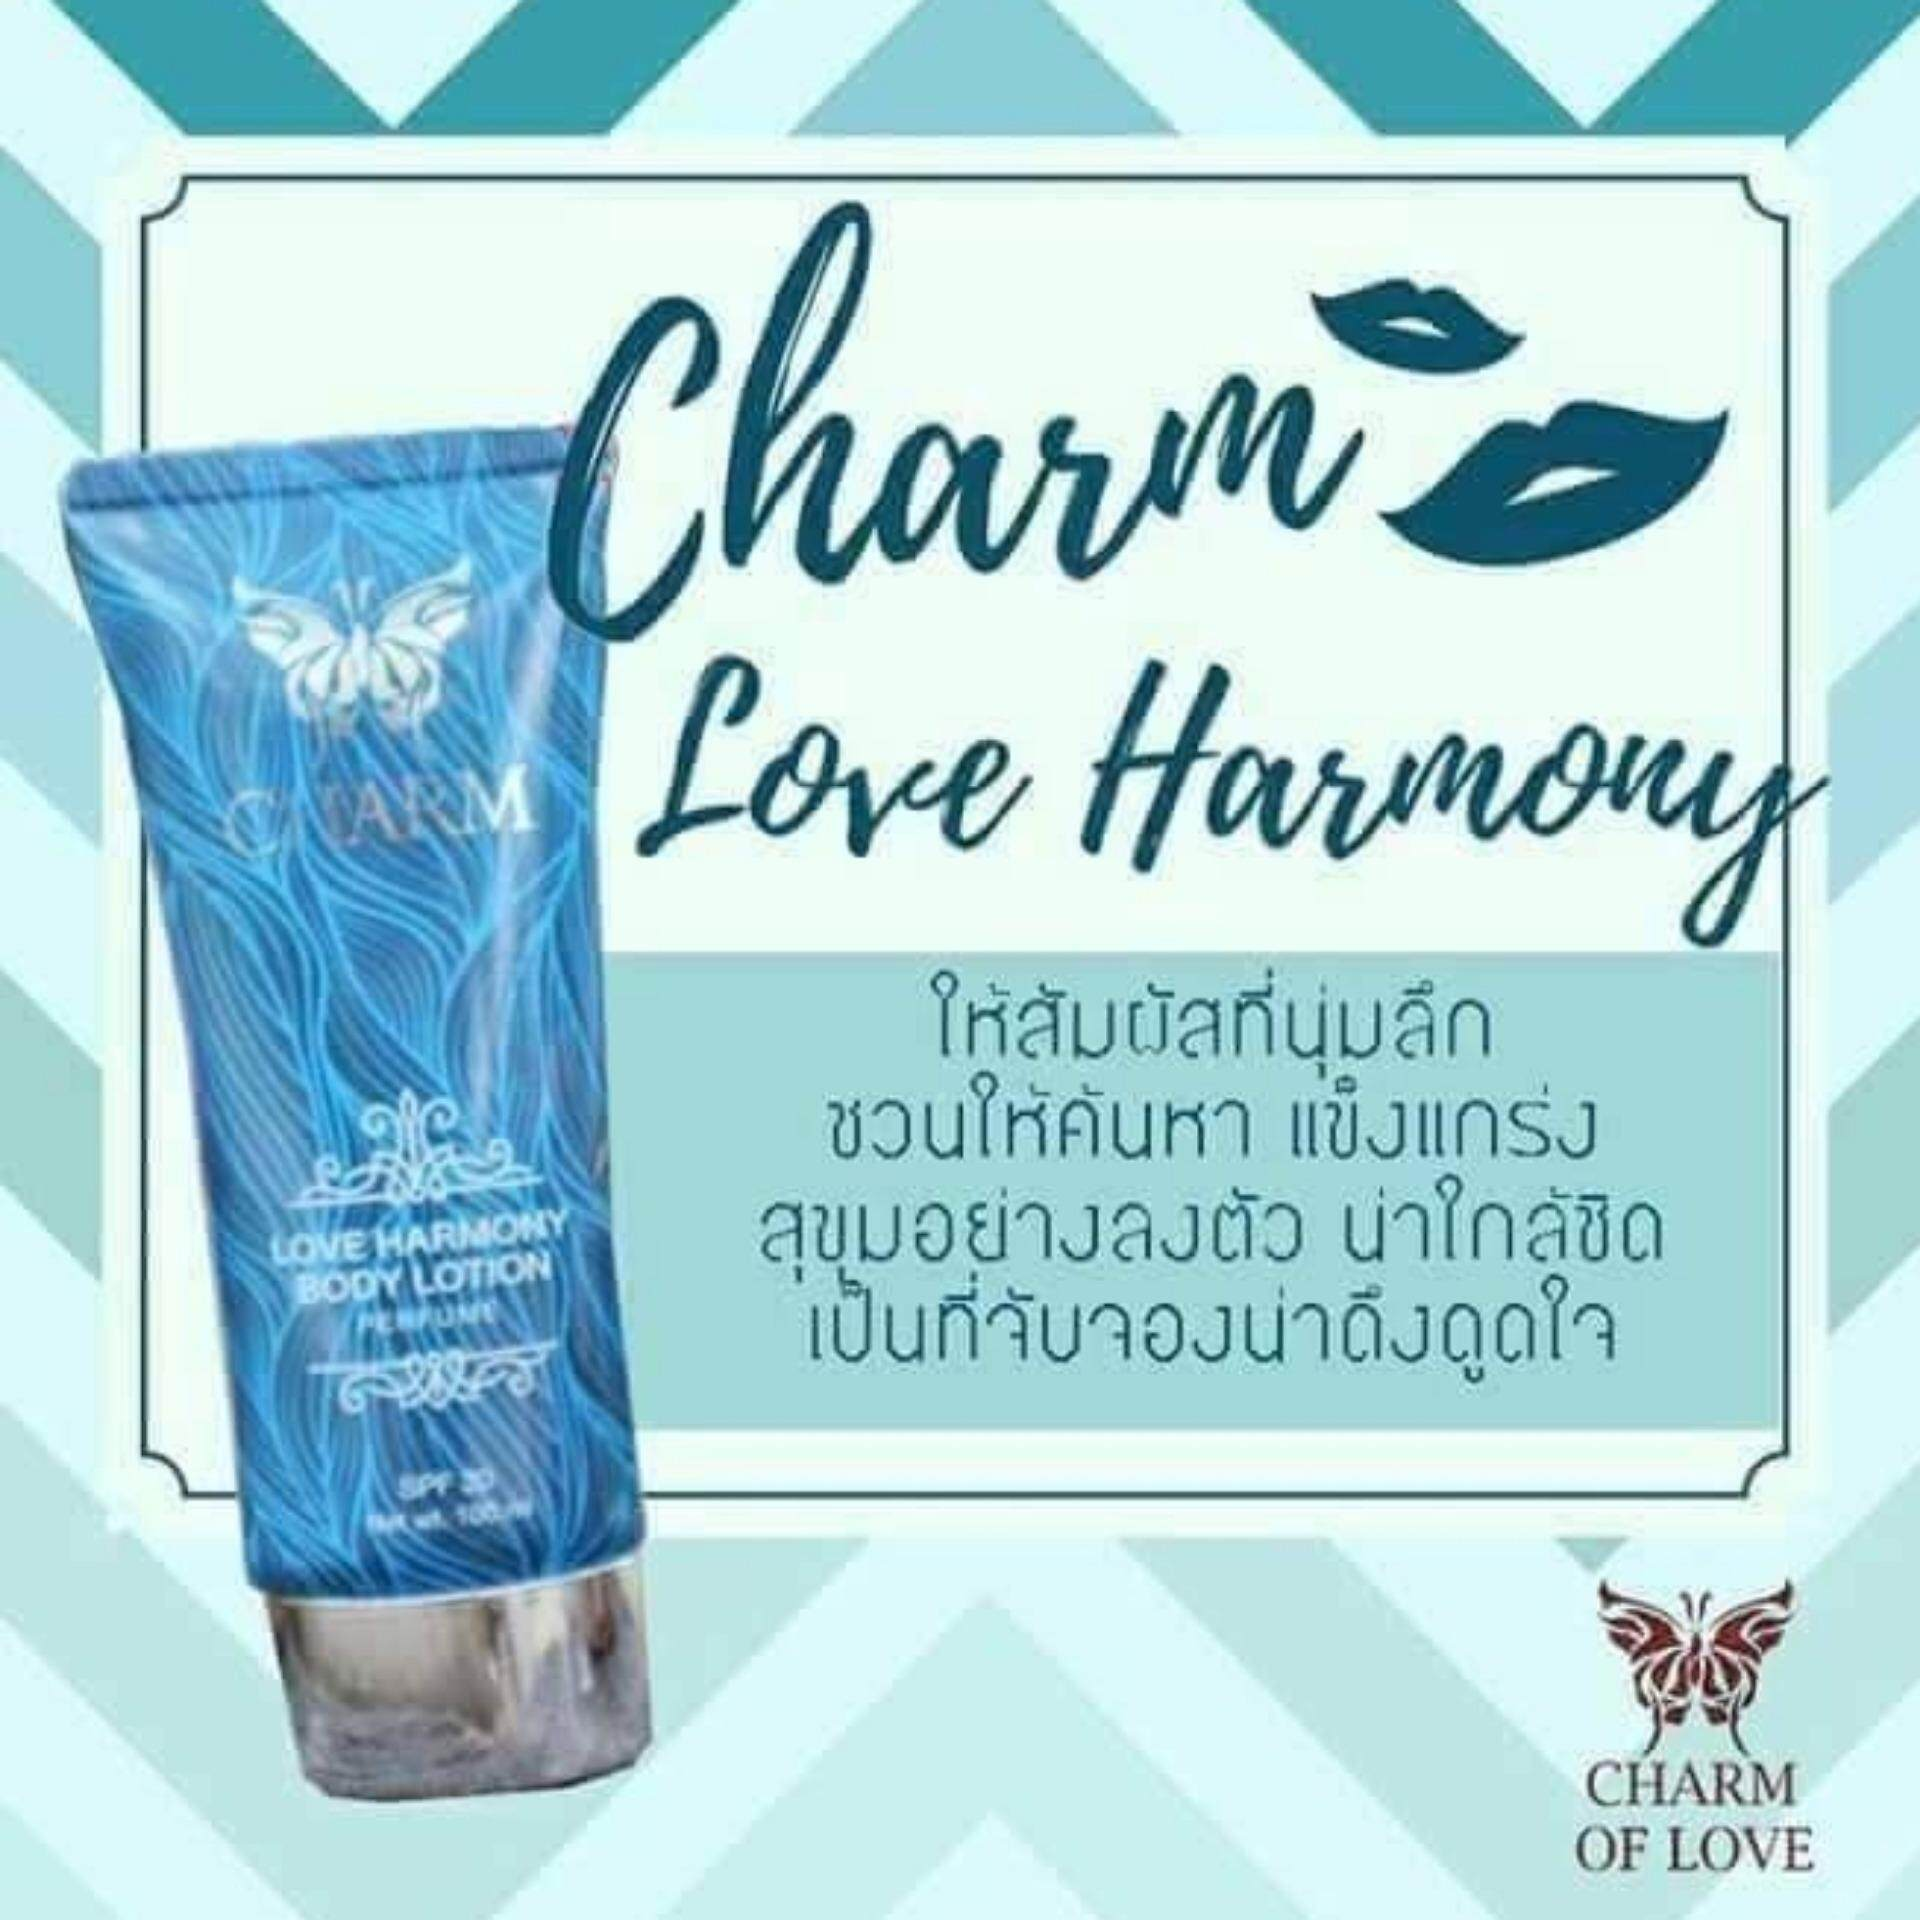 CHARM OF LOVE กลิ่น HARMONY ฟรี! เทสเตอร์ขนาด 5g เมื่อซื้อครบสองหลอด